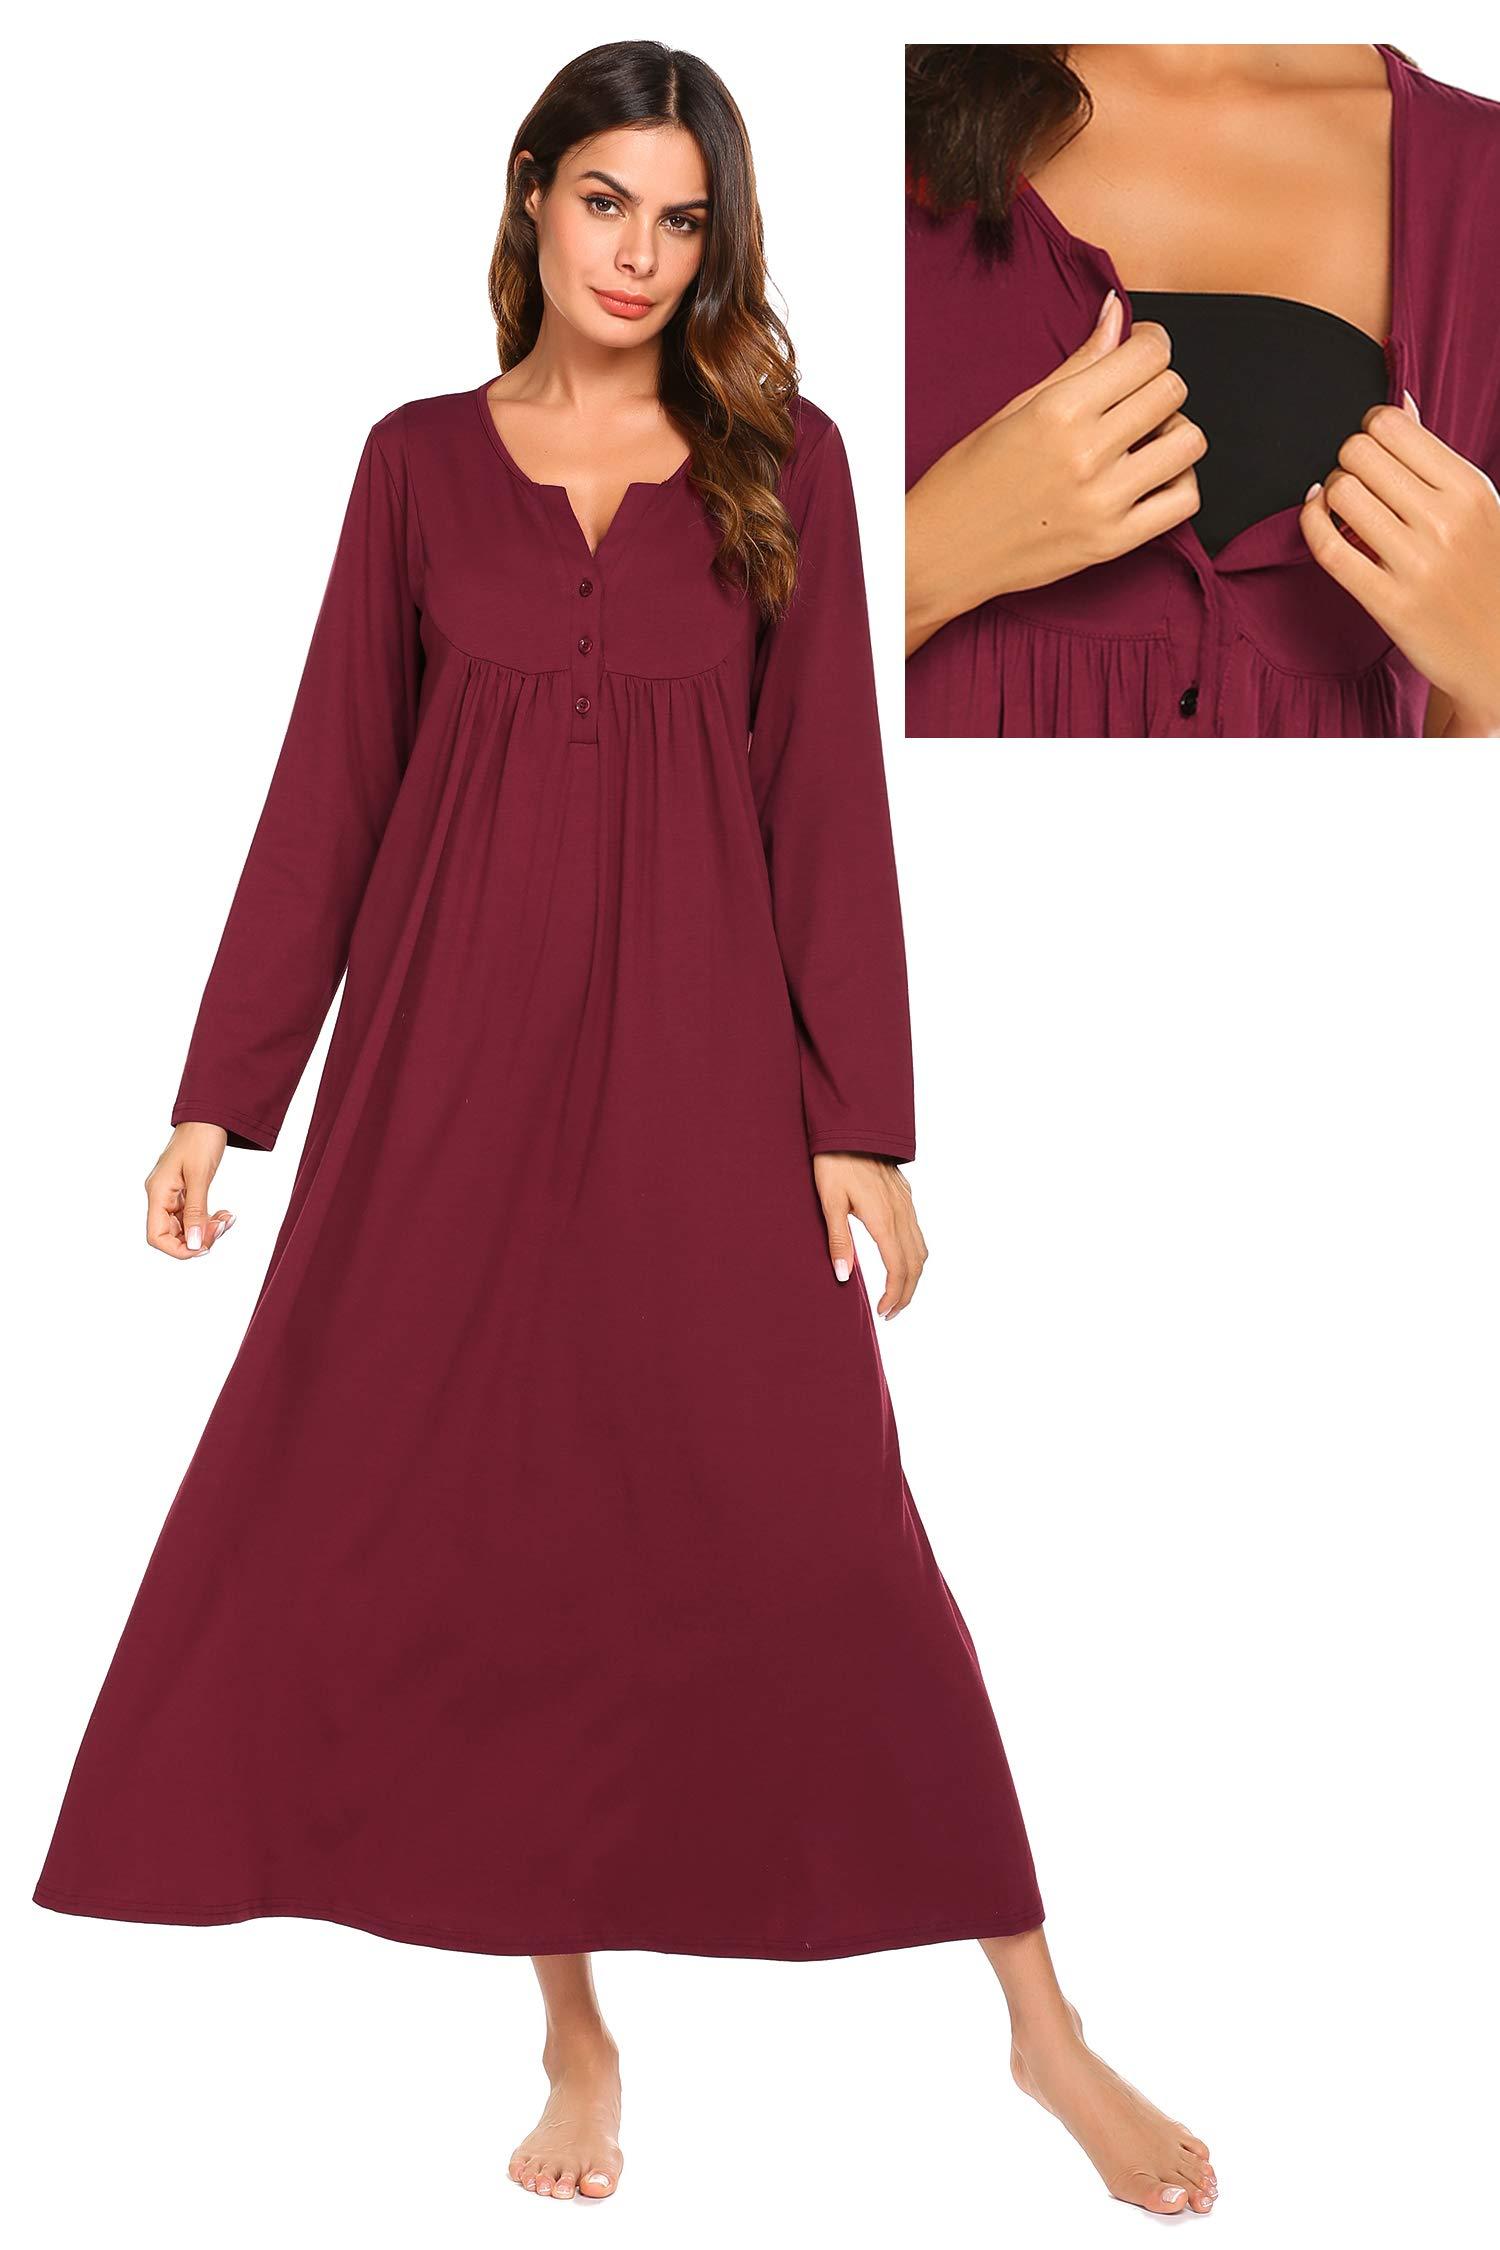 Ekouaer Maternity Nightgown, Nursing Dress Breastfeeding for Women ...